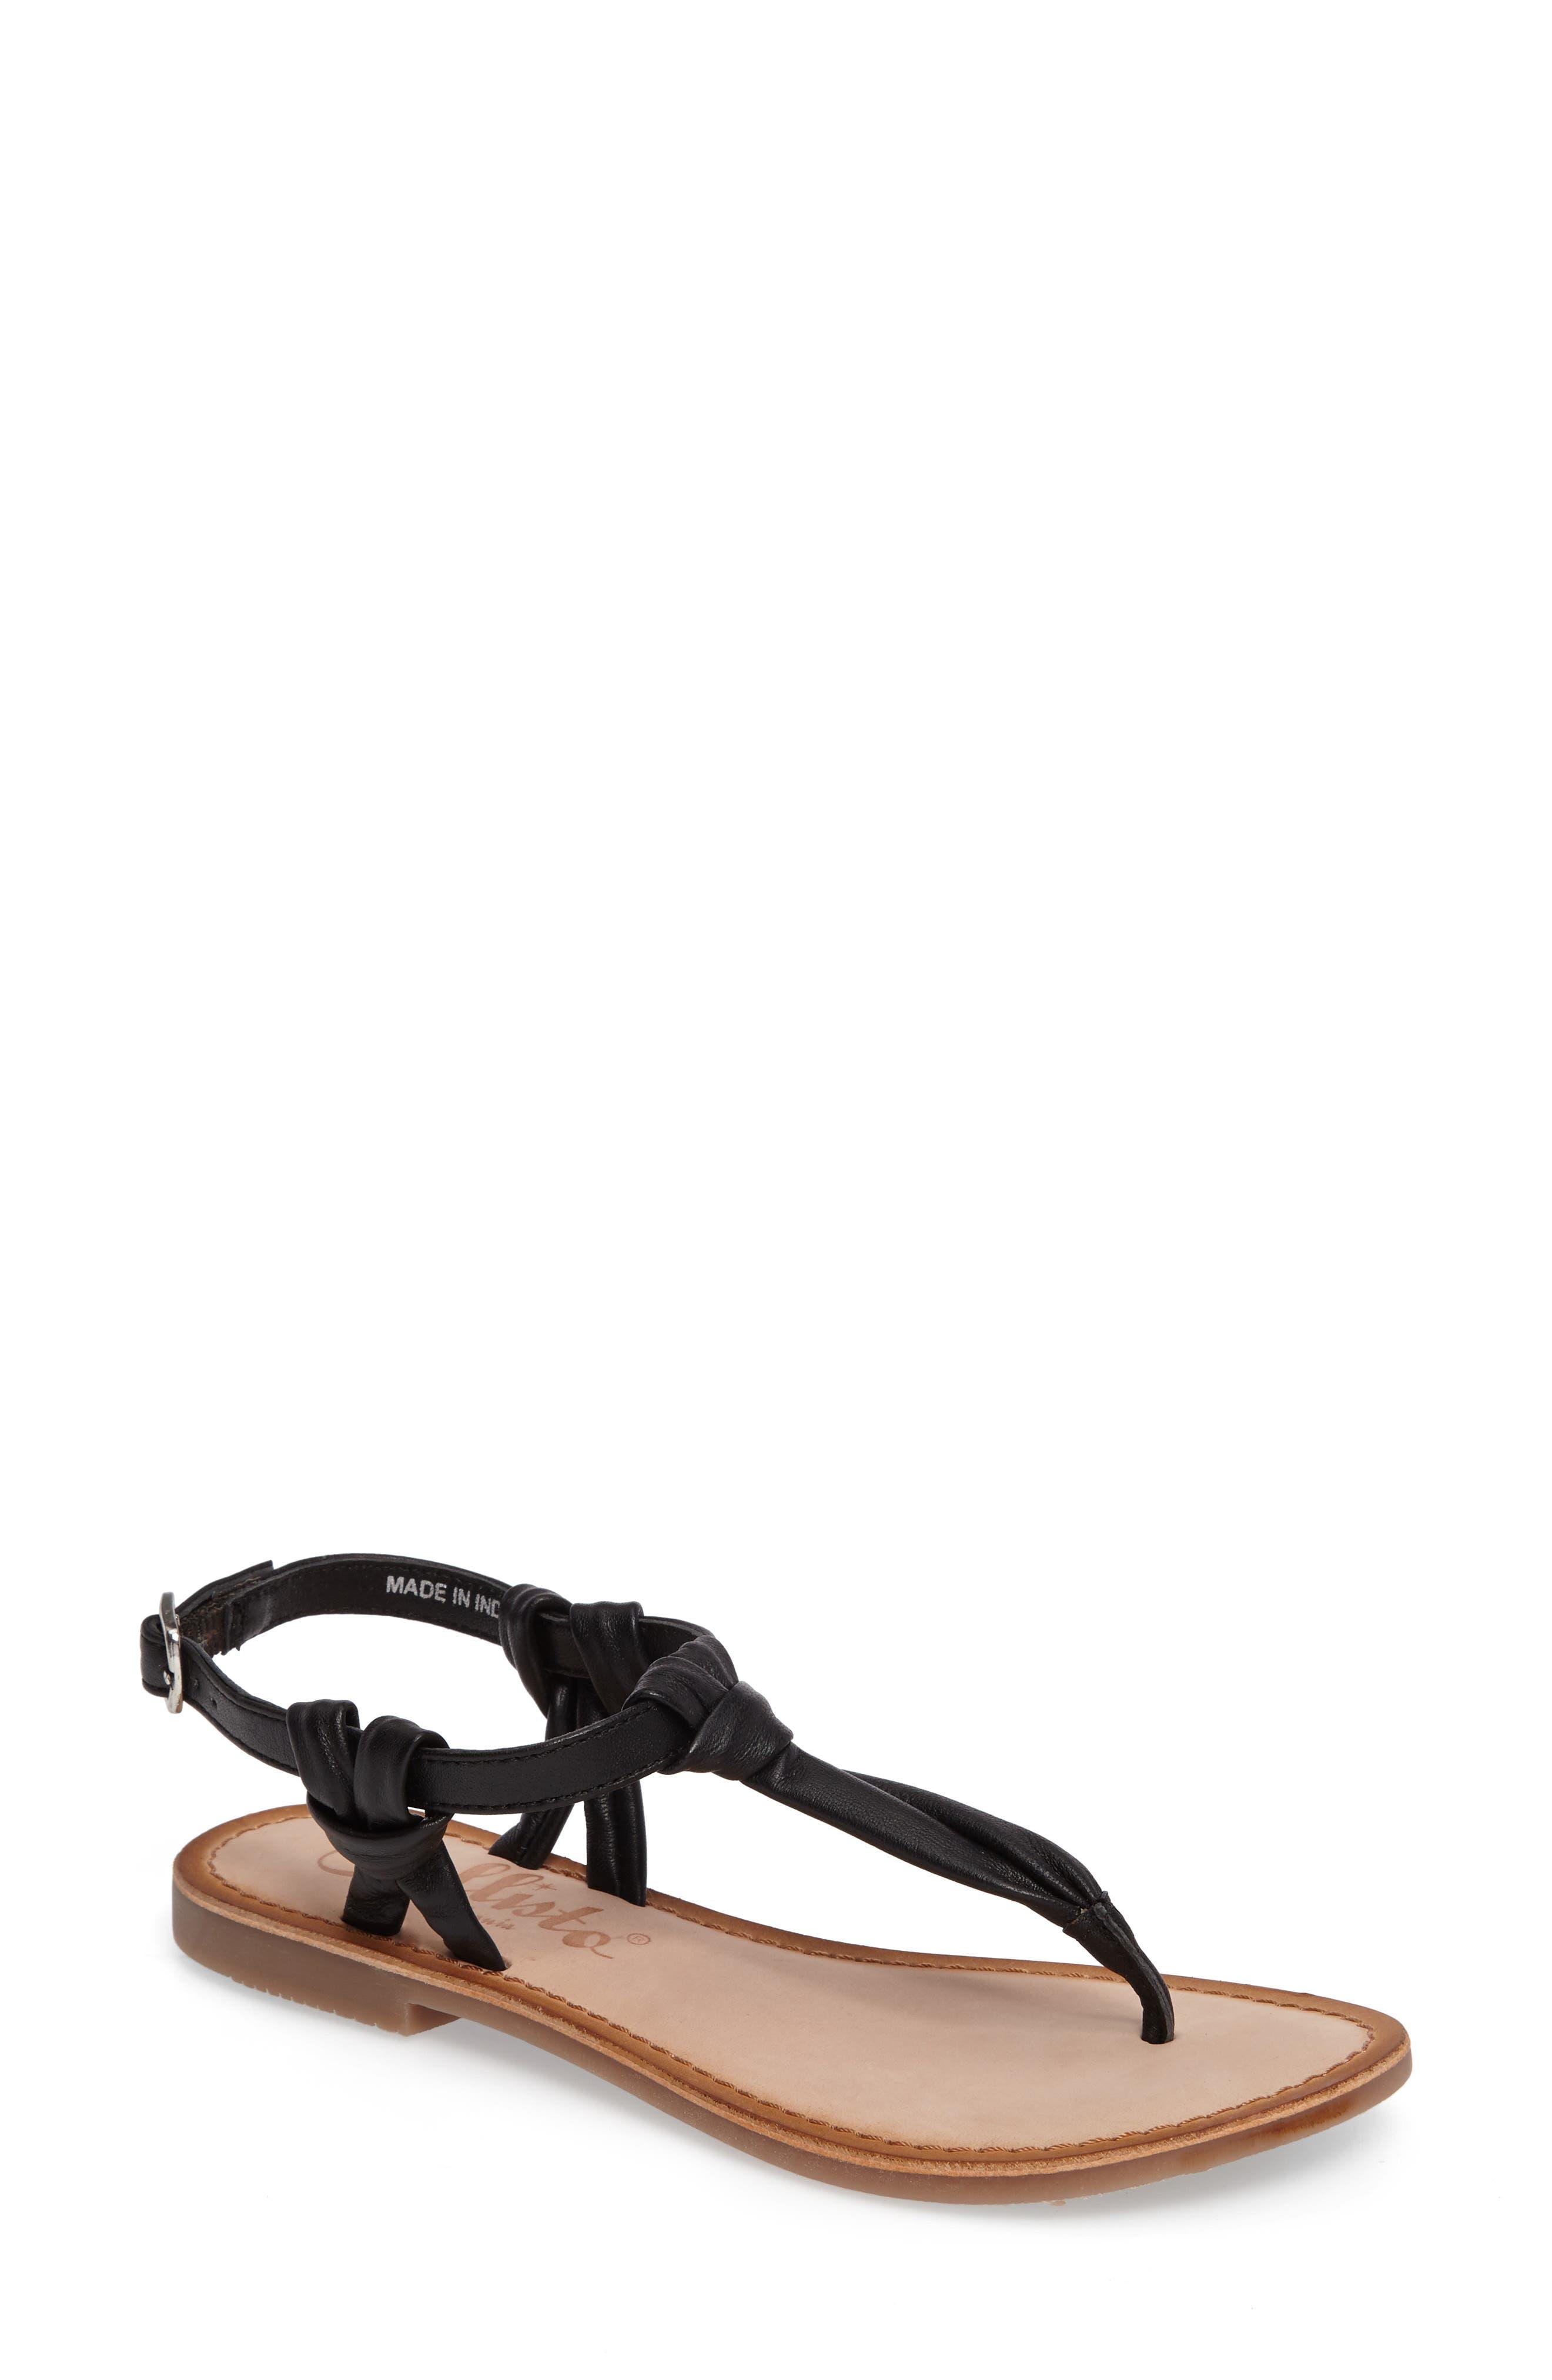 Azza T-Strap Sandal,                         Main,                         color, Black Leather